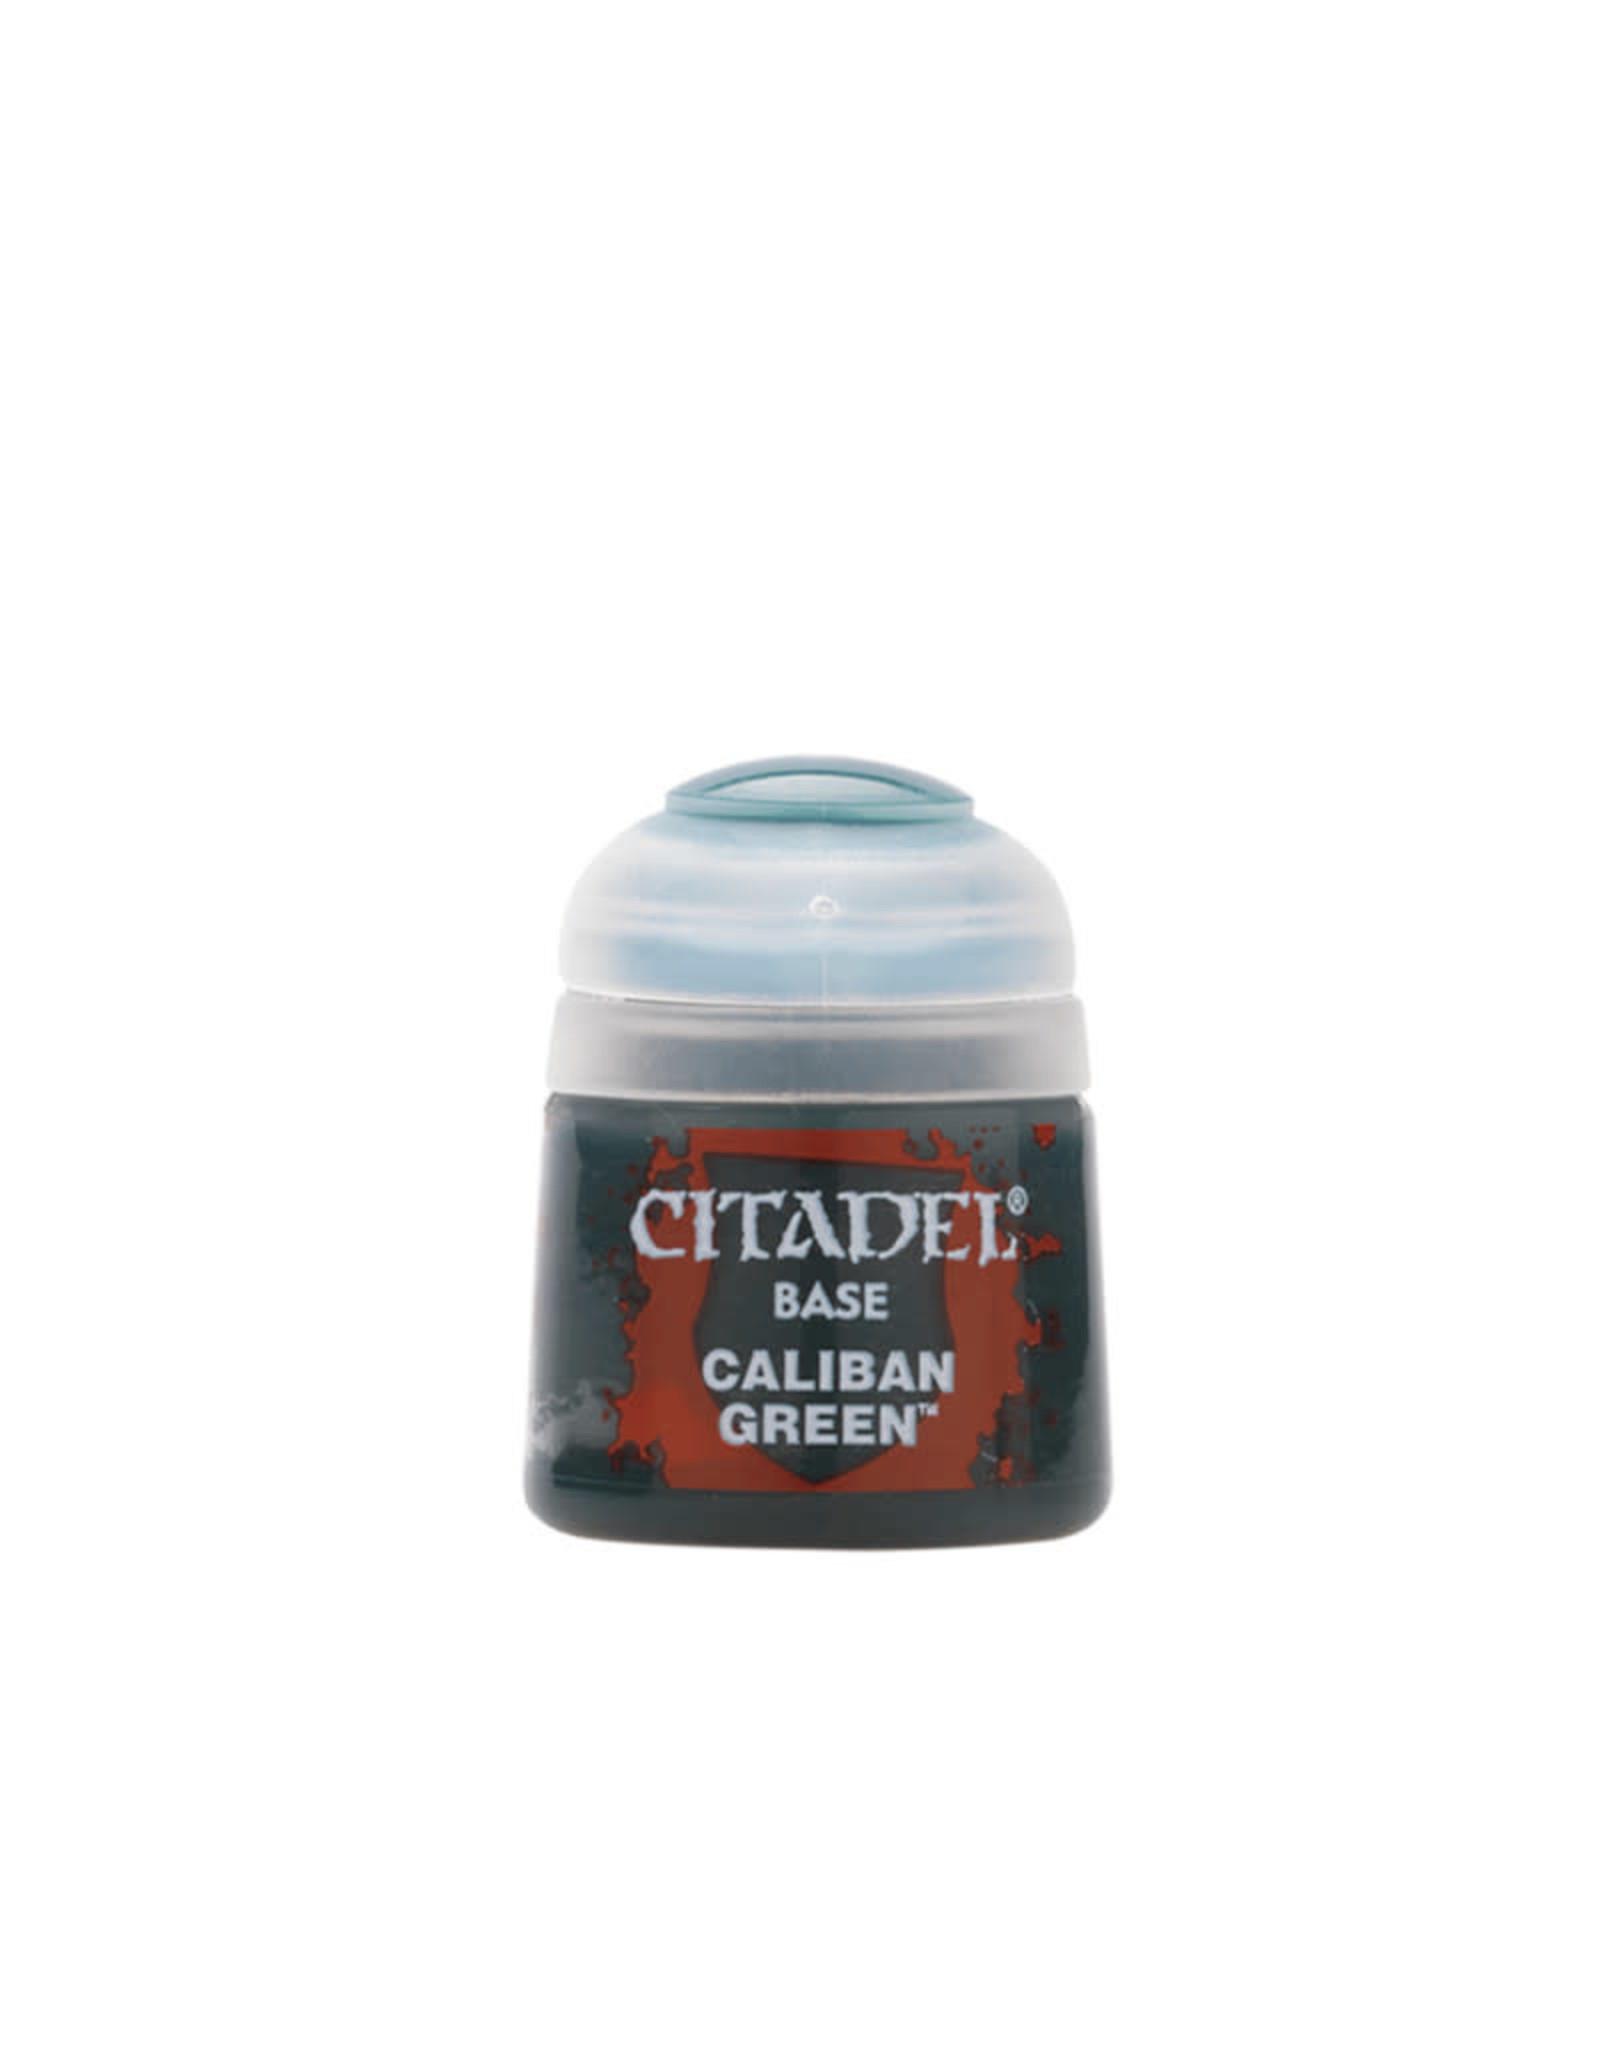 Citadel Base Paint: Caliban Green